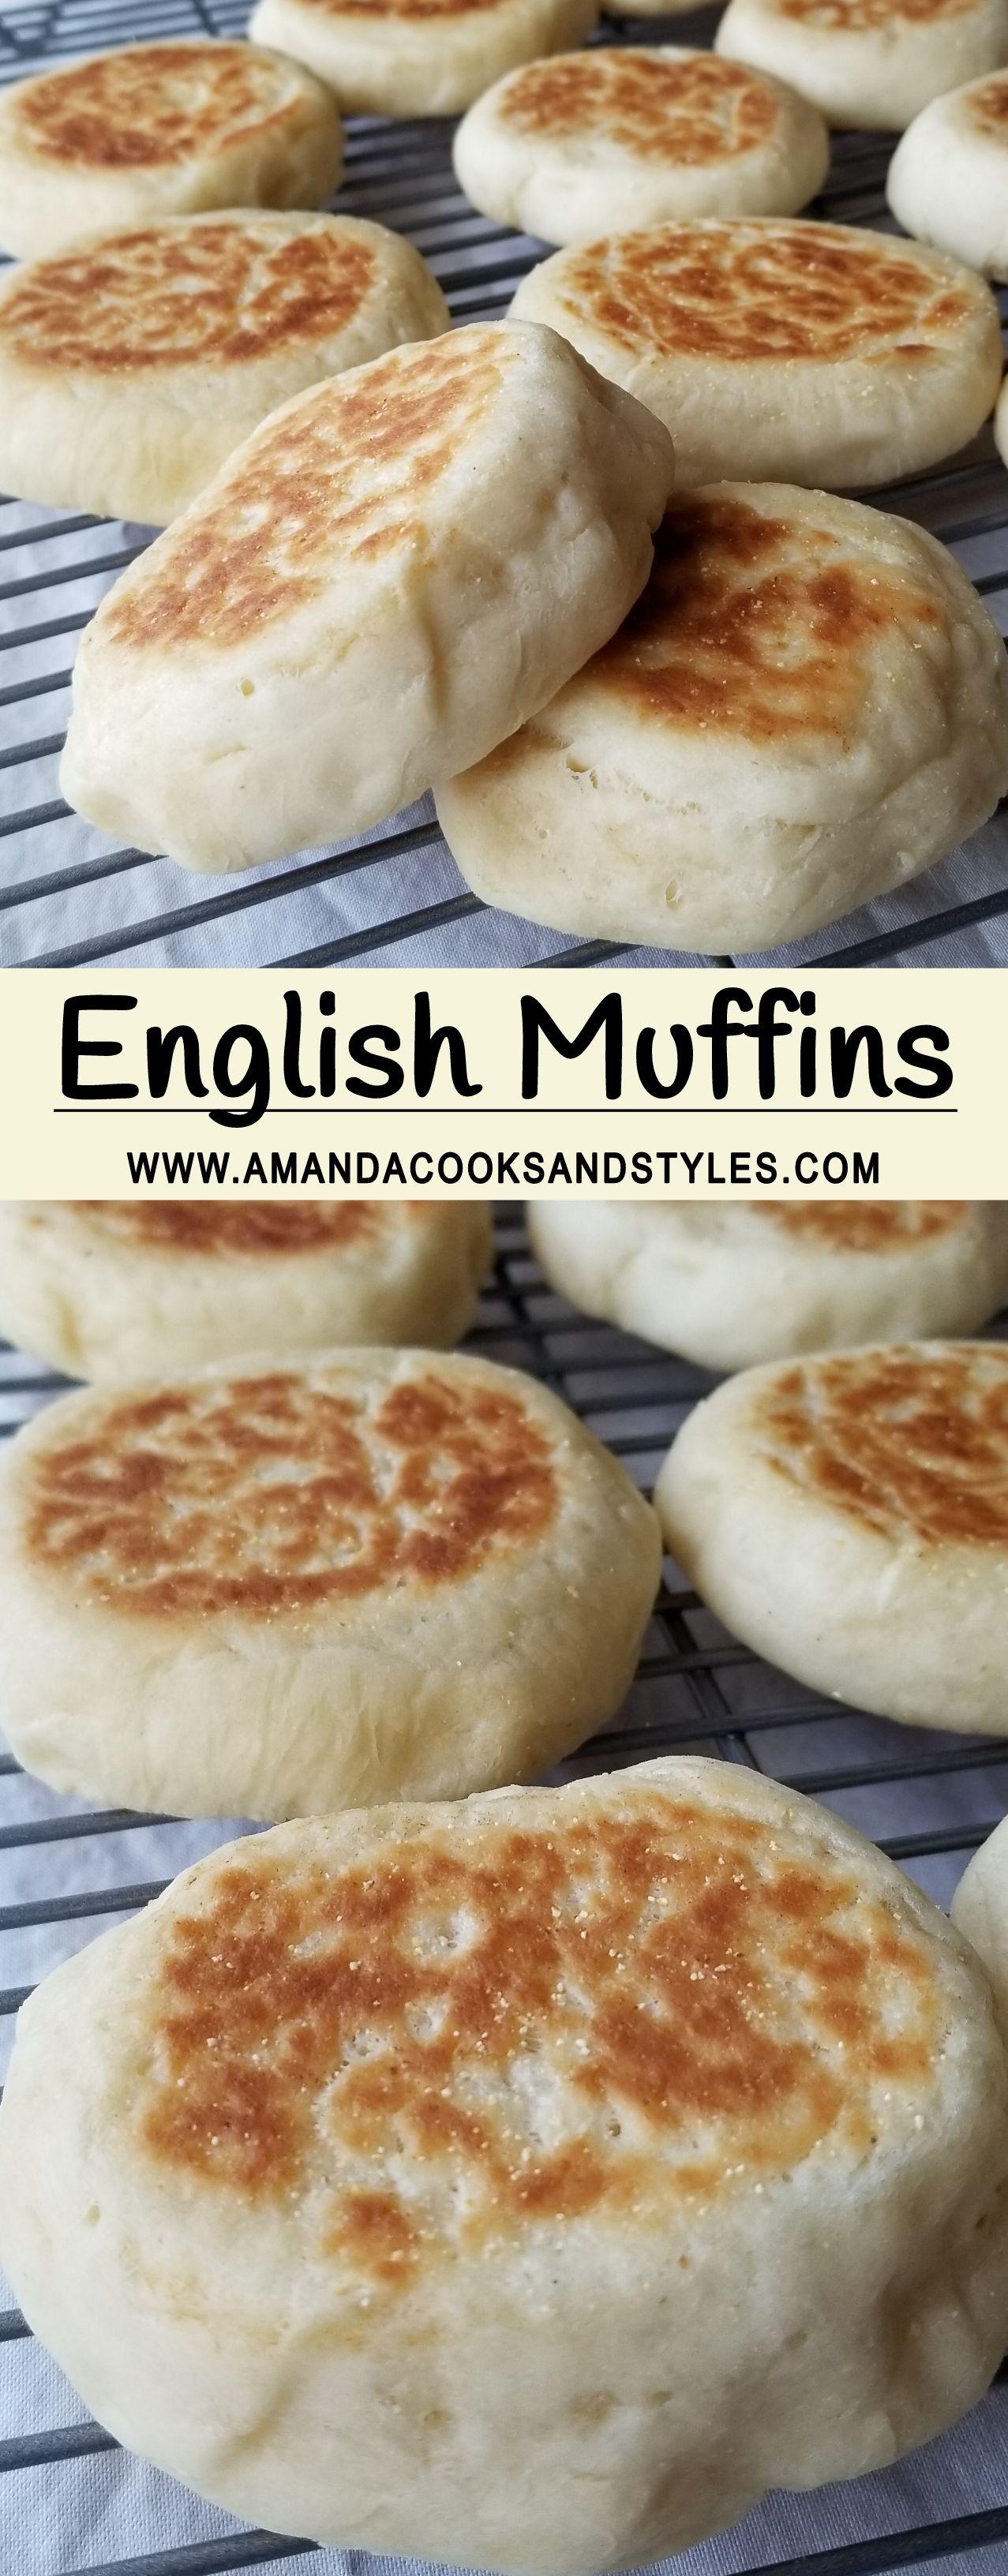 English Muffins Homemade English Muffins English Muffin Recipes Vegan English Muffin Recipe